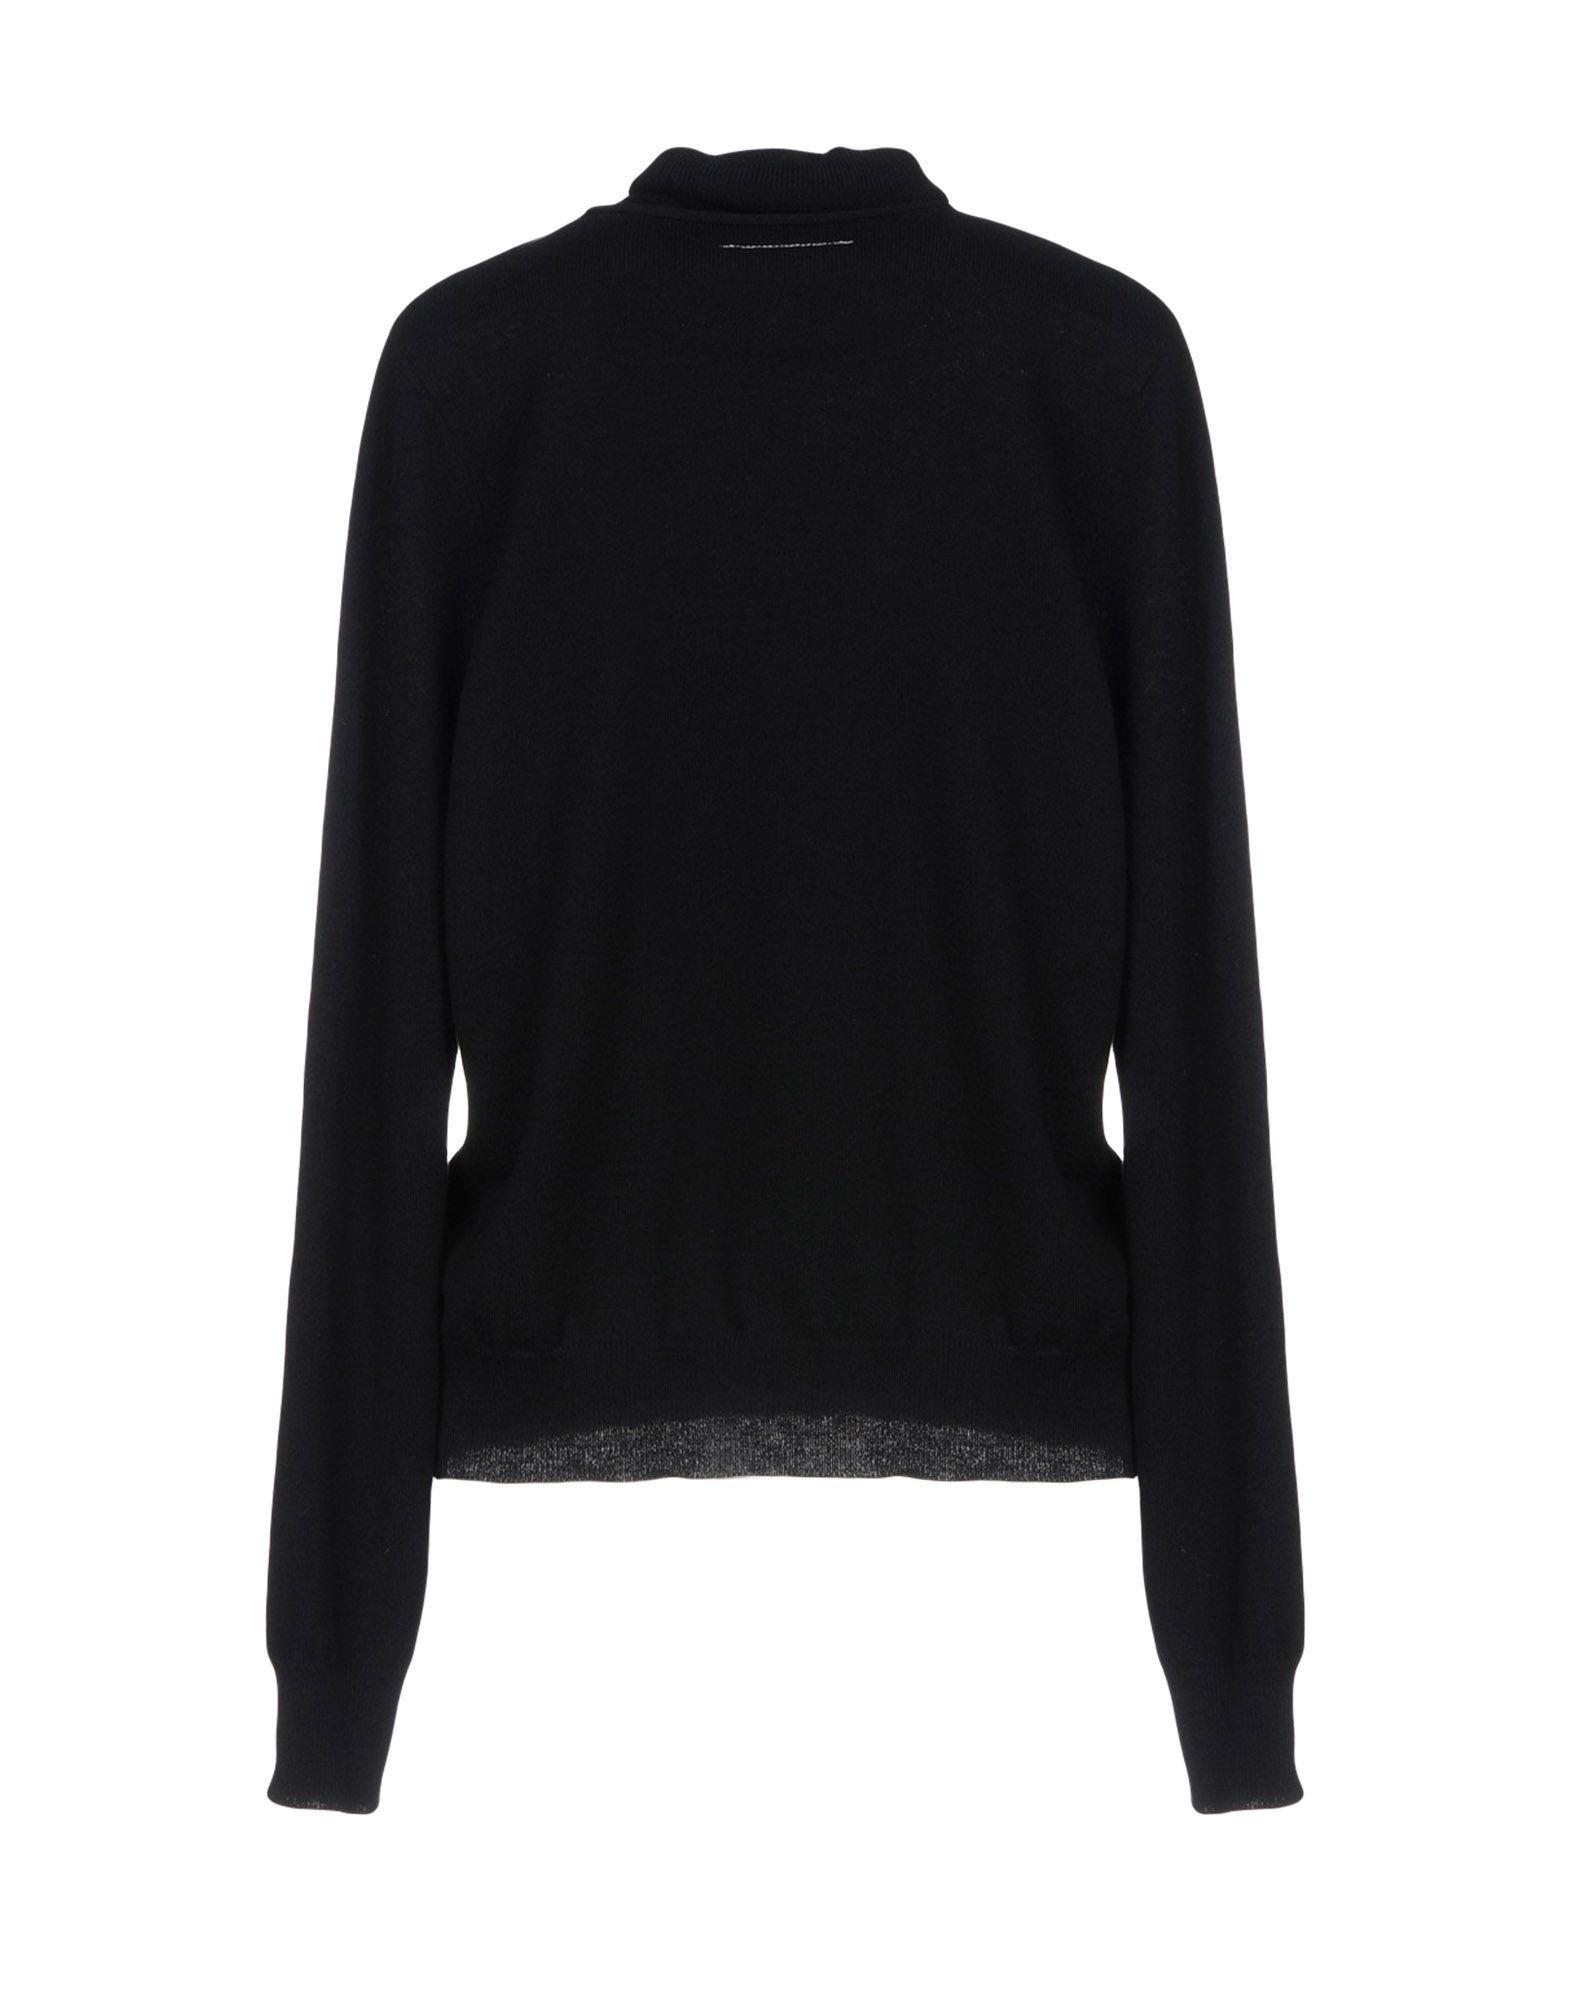 MM6 Maison Margiela Black Wool Jumper